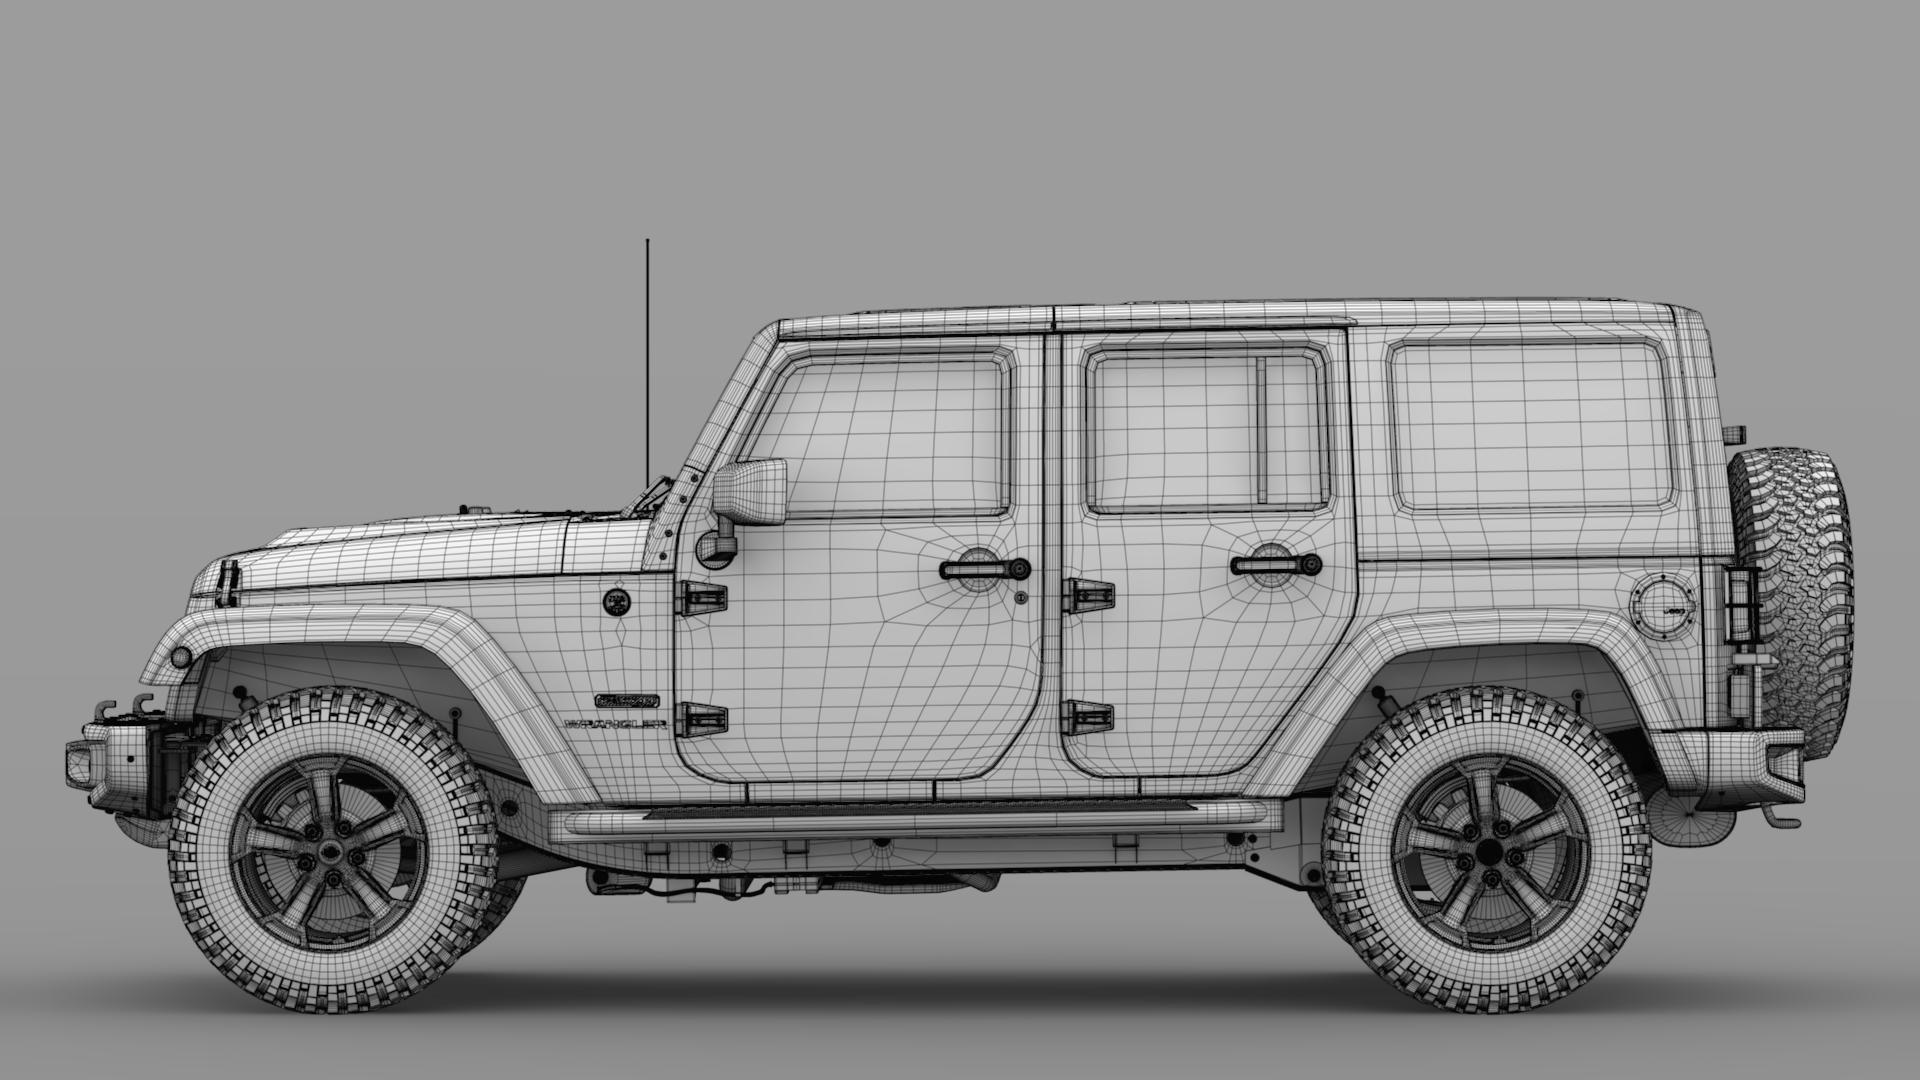 jeep wrangler unlimited rubicon recon jk 2017 3d model max fbx c4d lwo ma mb hrc xsi obj 277013